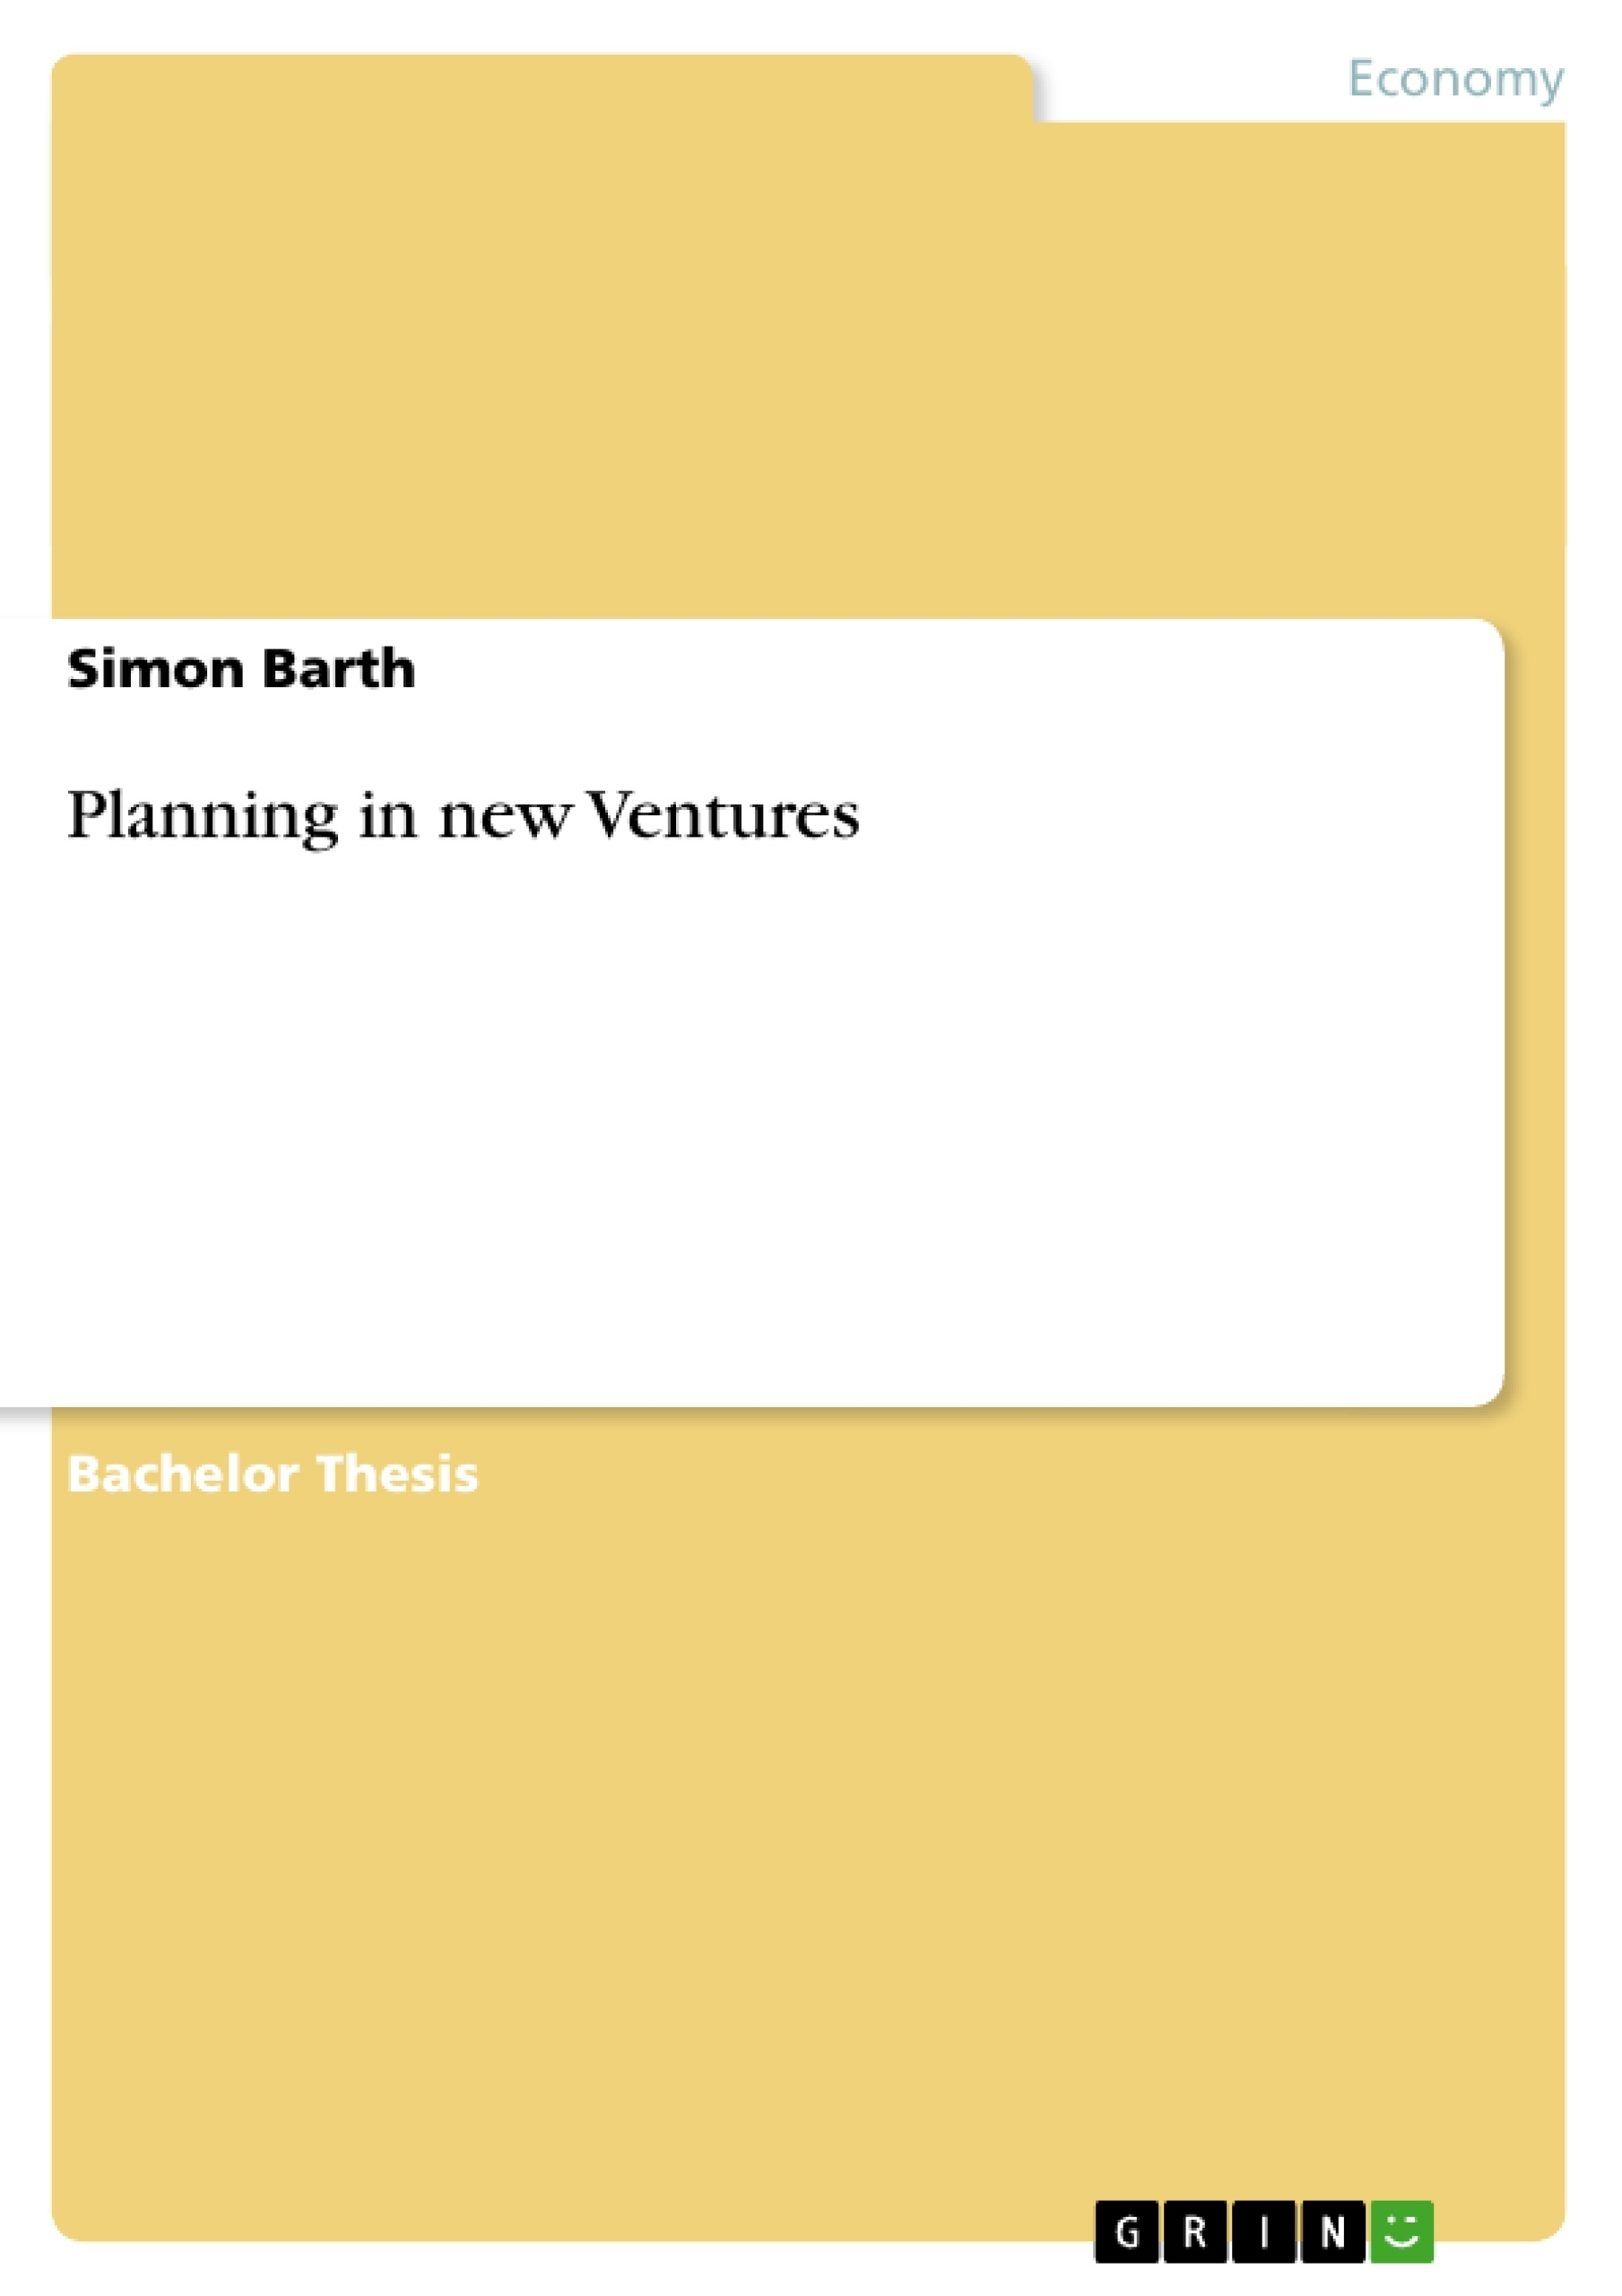 Title: Planning in new Ventures